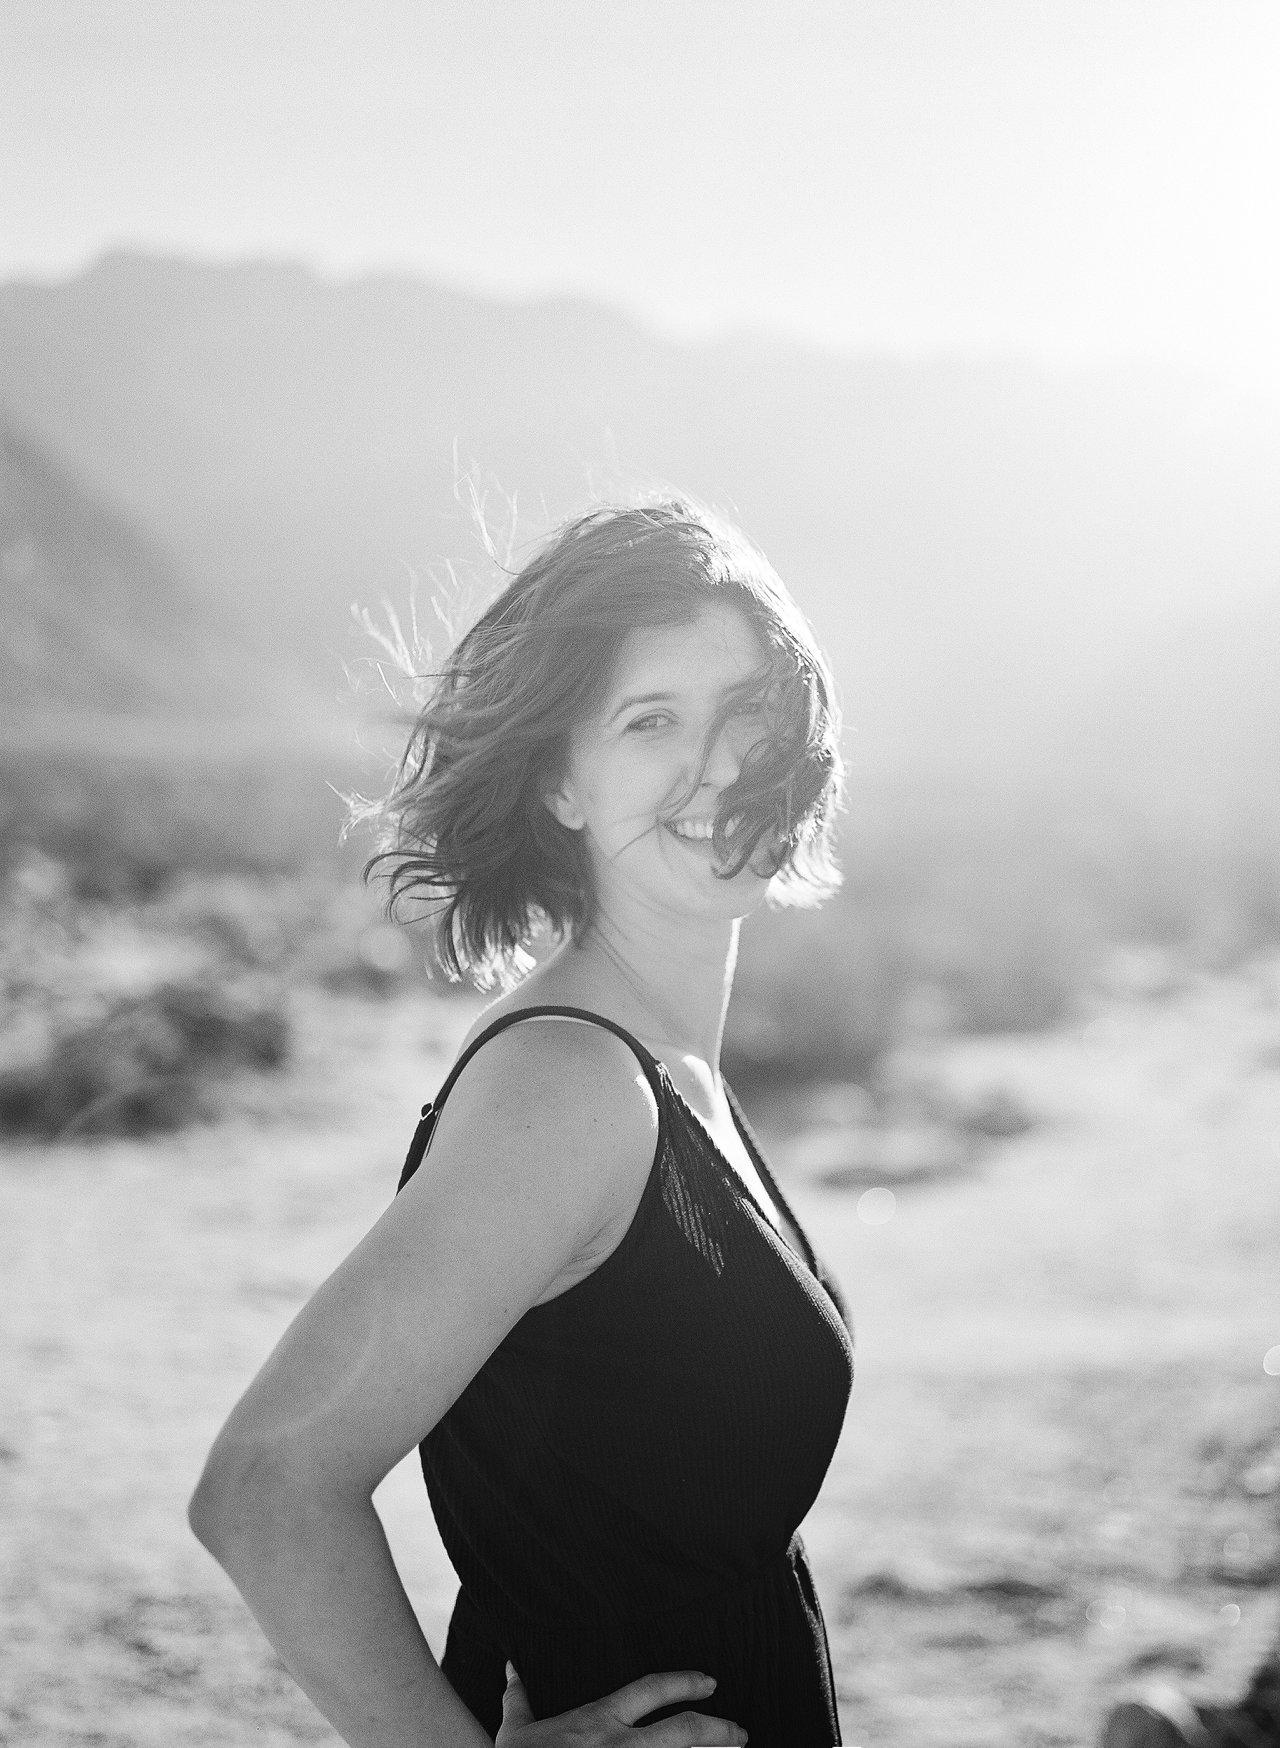 Photo taken by Kim Hildebrand